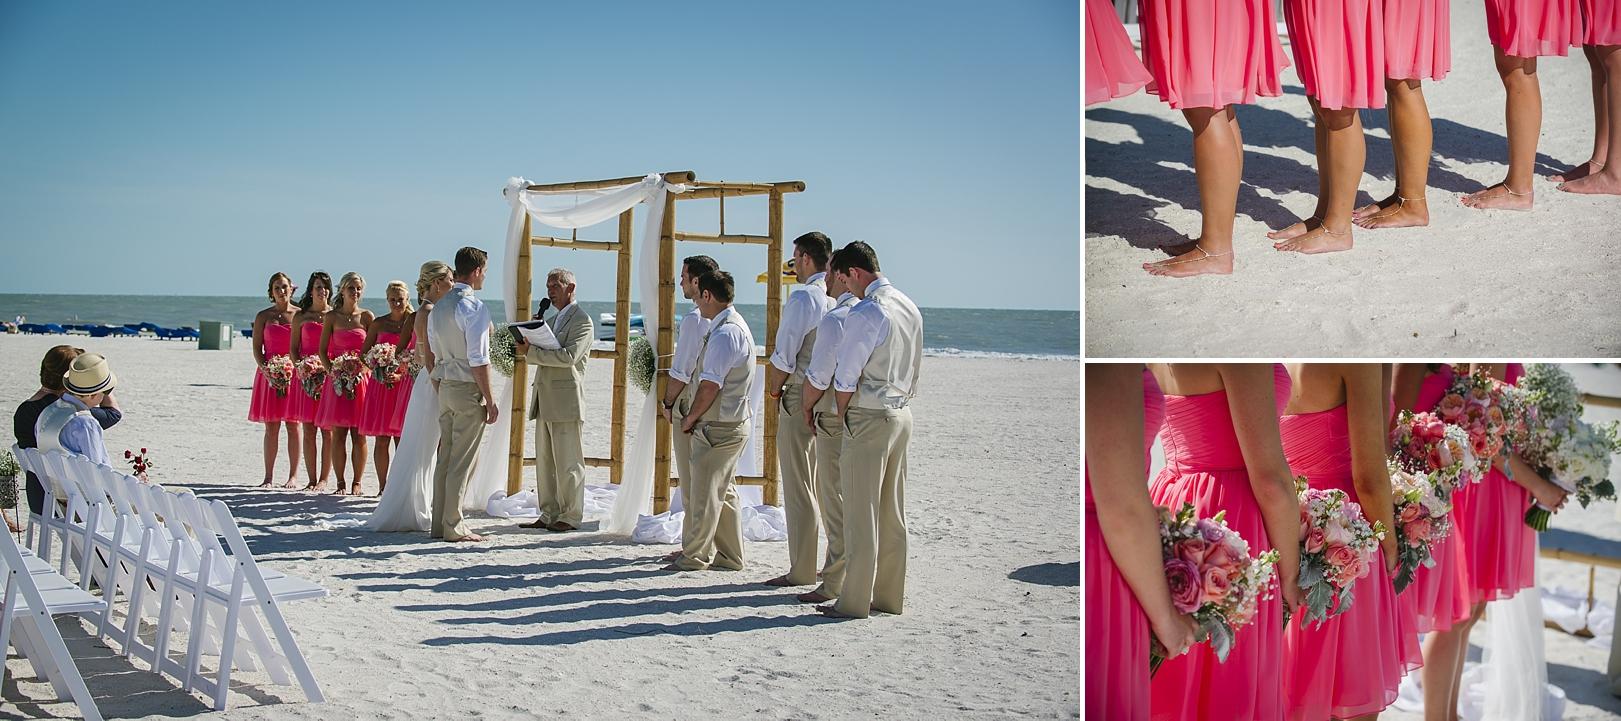 coral pink sirata beach wedding photos